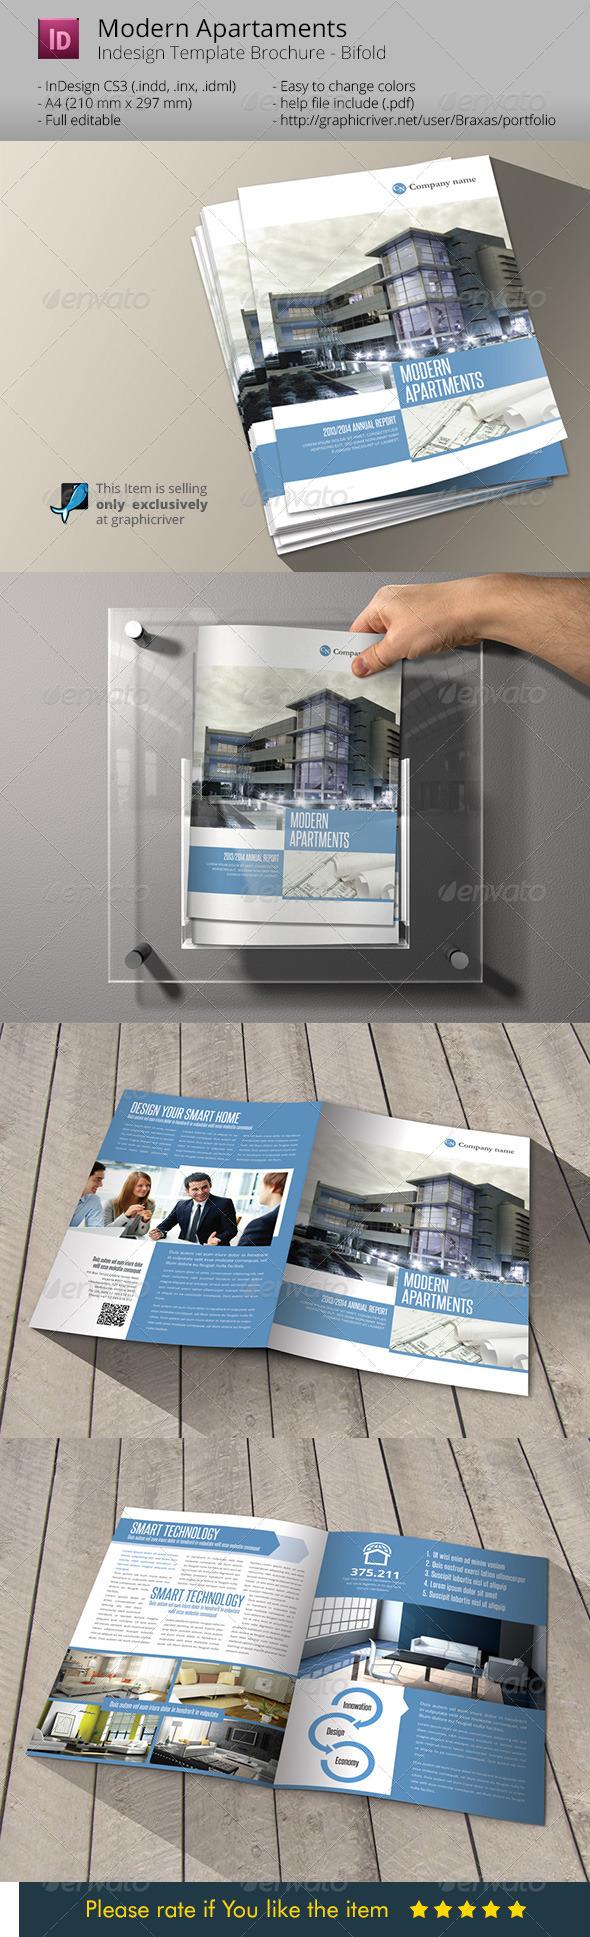 Modern Apartaments Indesign Template Brochure A4 - Informational Brochures